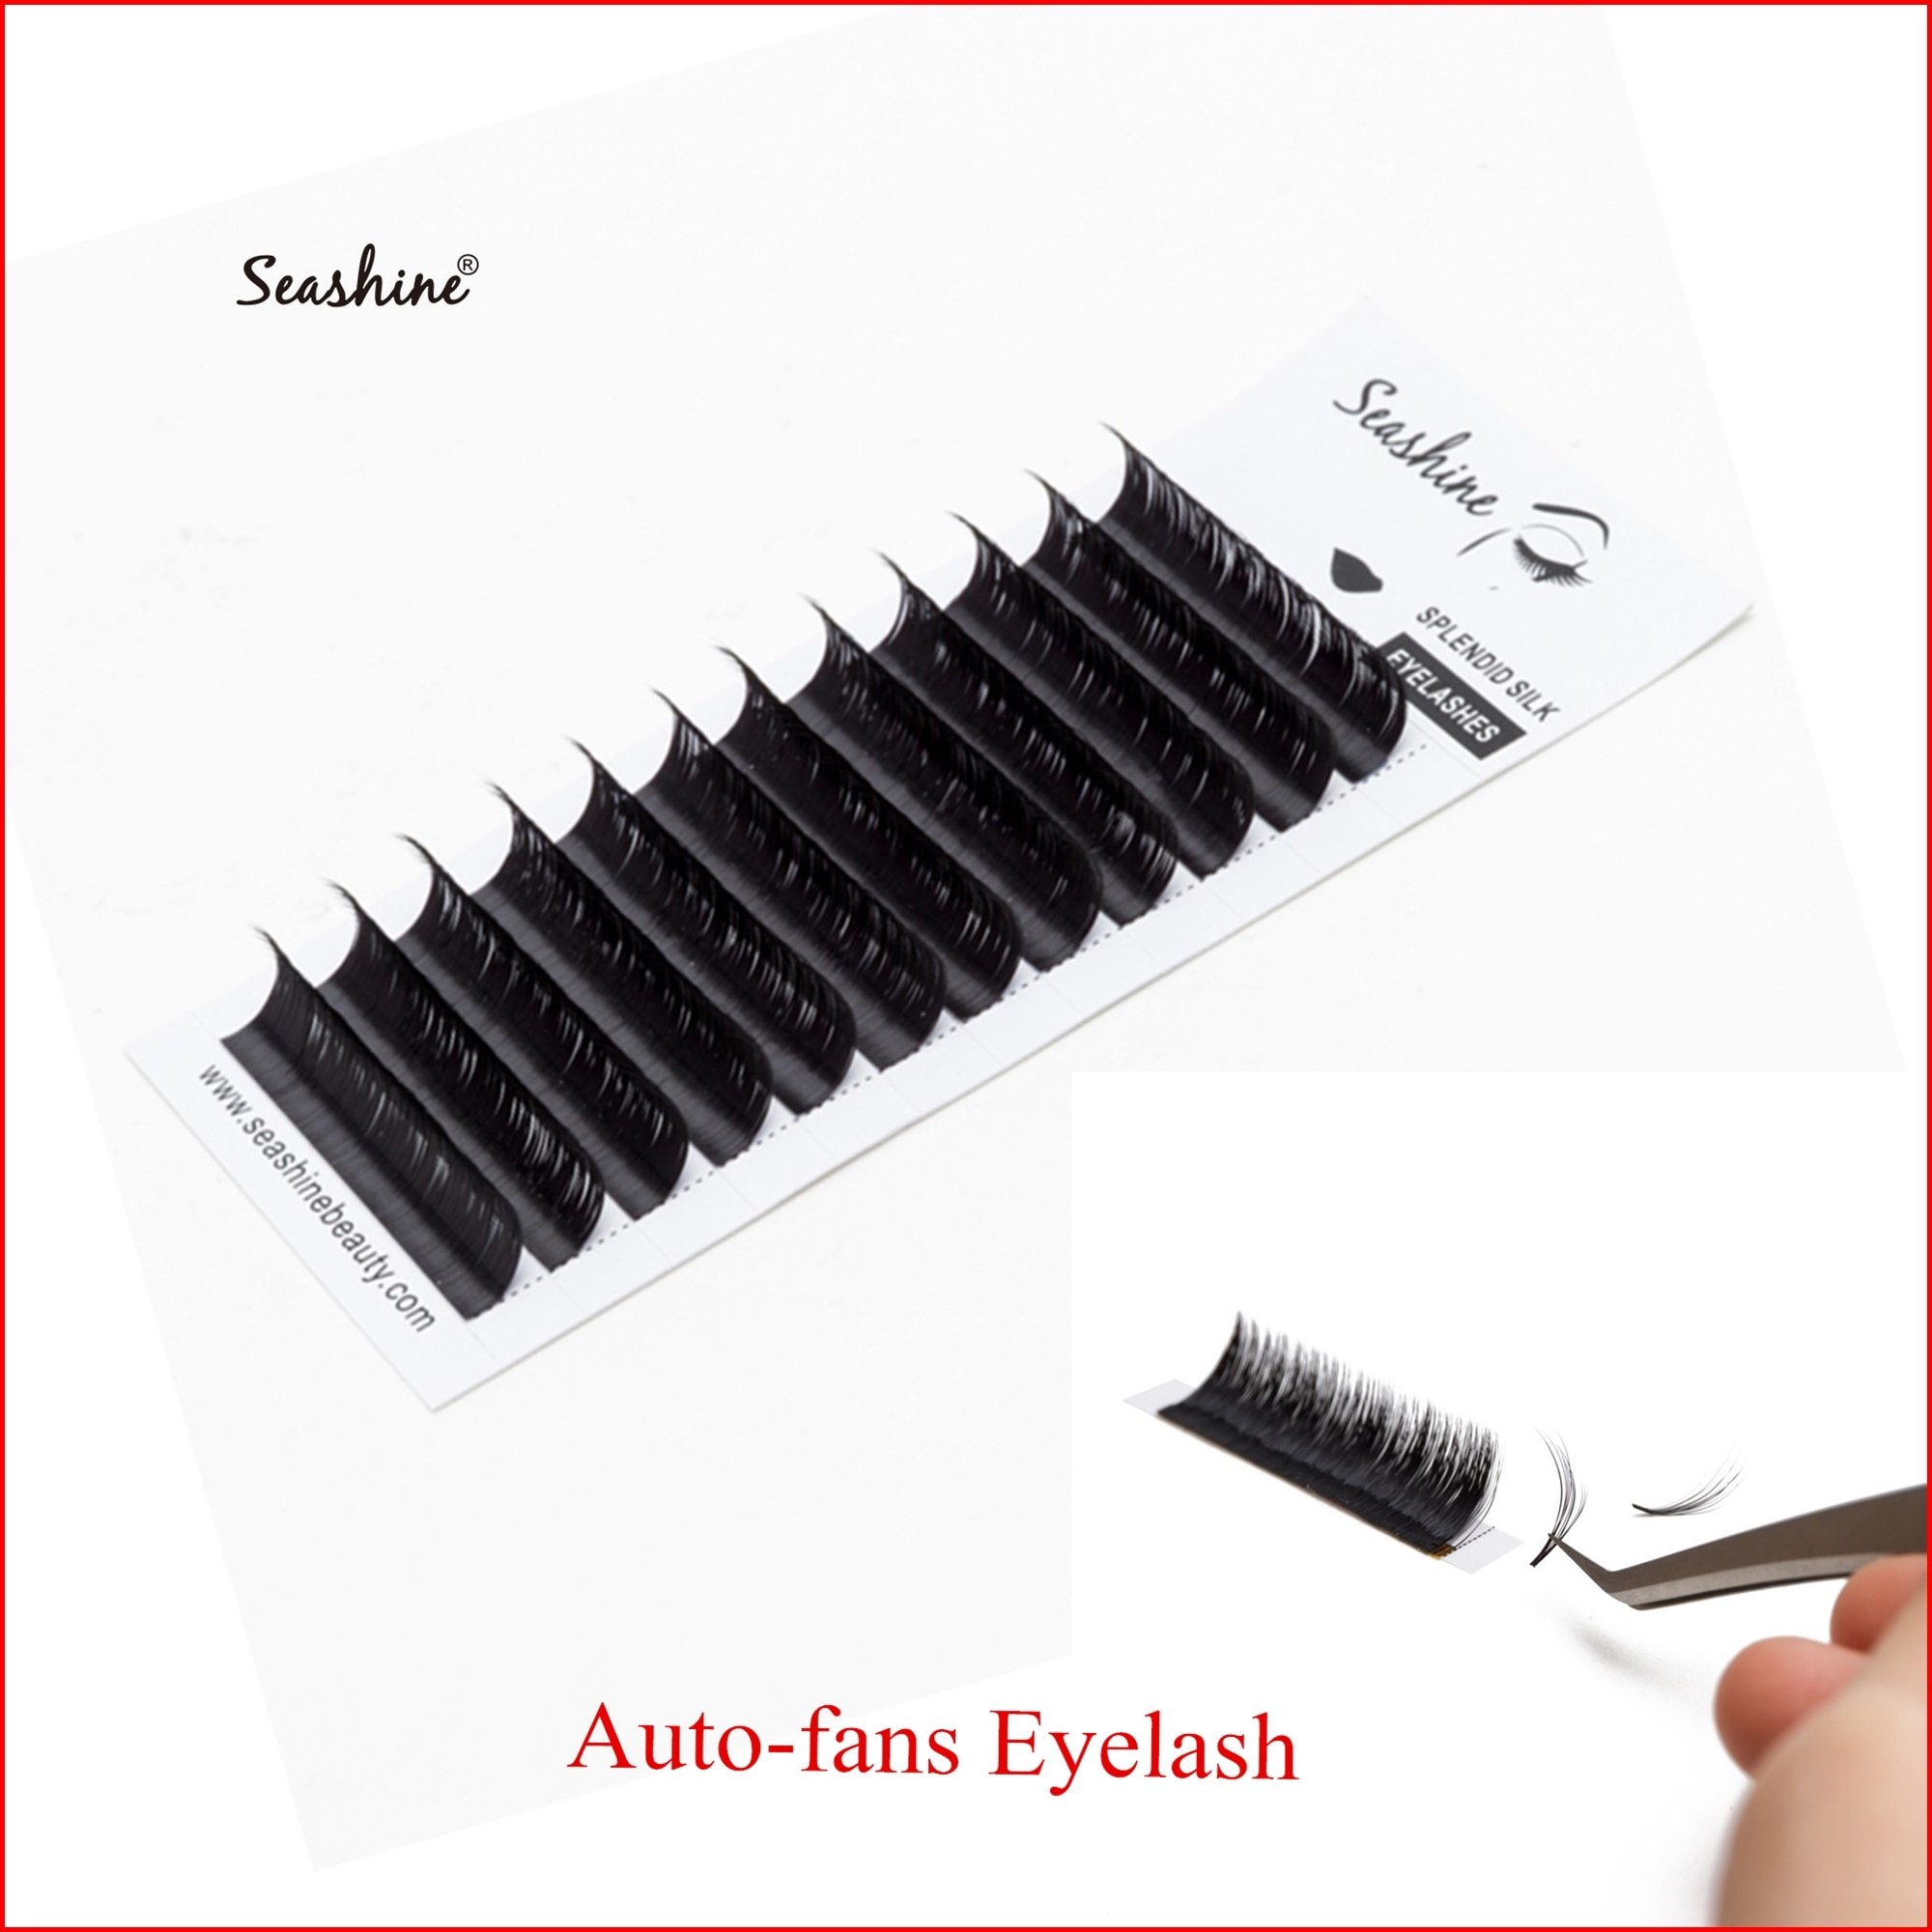 Seashine Easy Fanning Auto Fans Eyelash Extension Fast Bloom Flowering Mega Volume Lashes Pre-bonded Eyelash